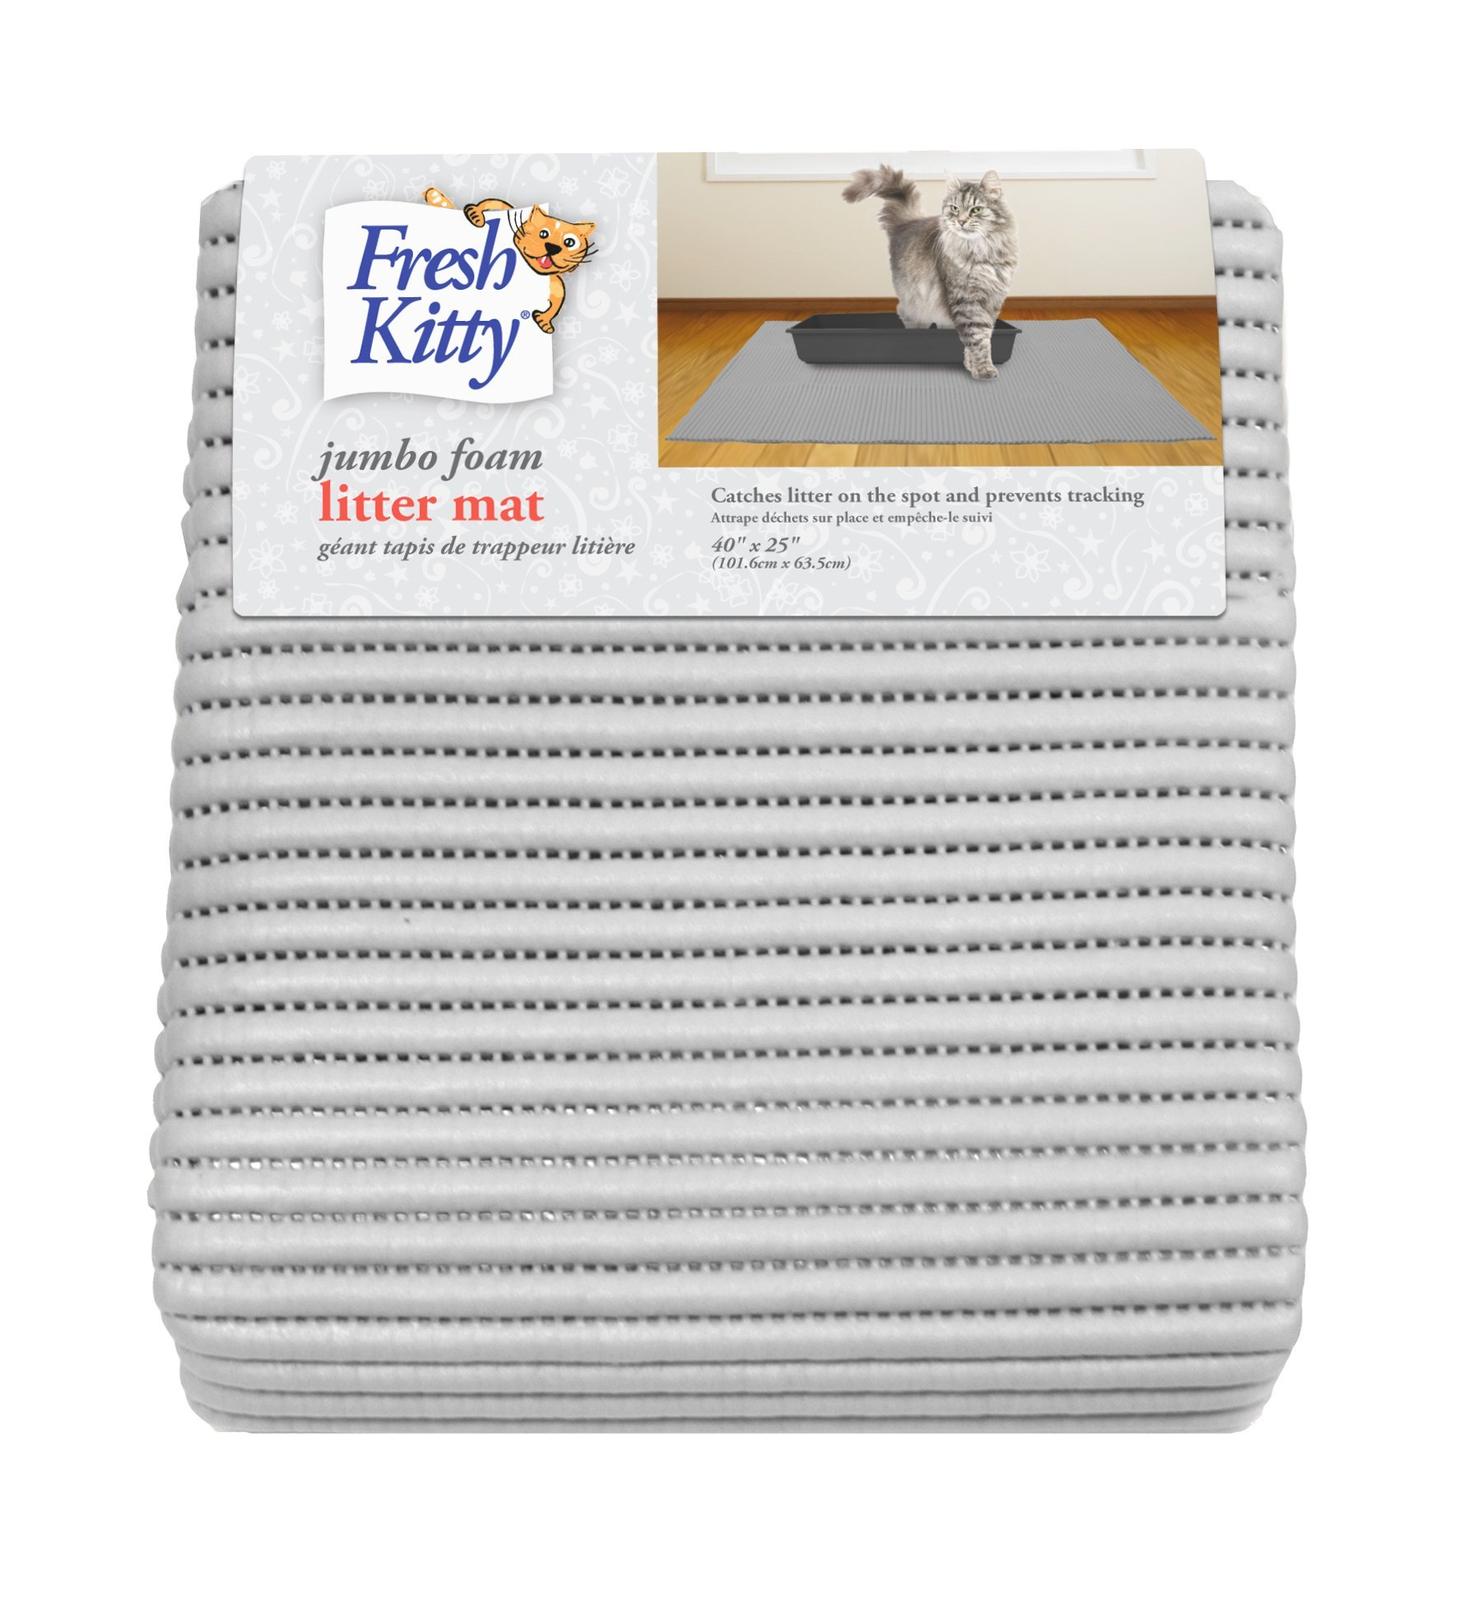 Fresh Kitty Jumbo Foam Cat Litter Mat, Gray, Jumbo